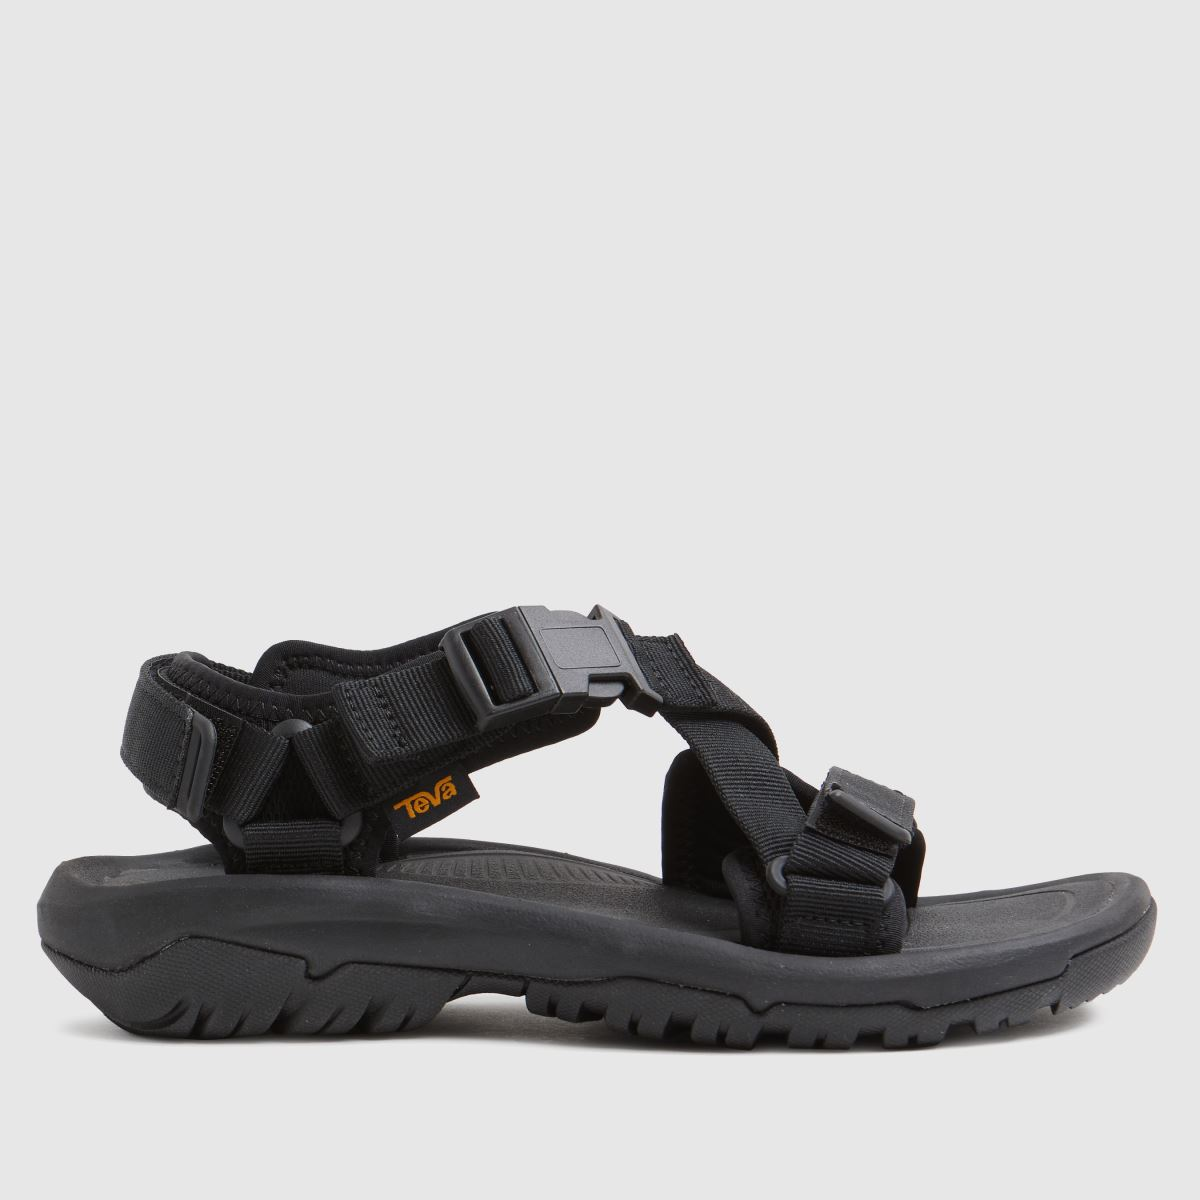 Teva Black Performance Hurricane Sandals